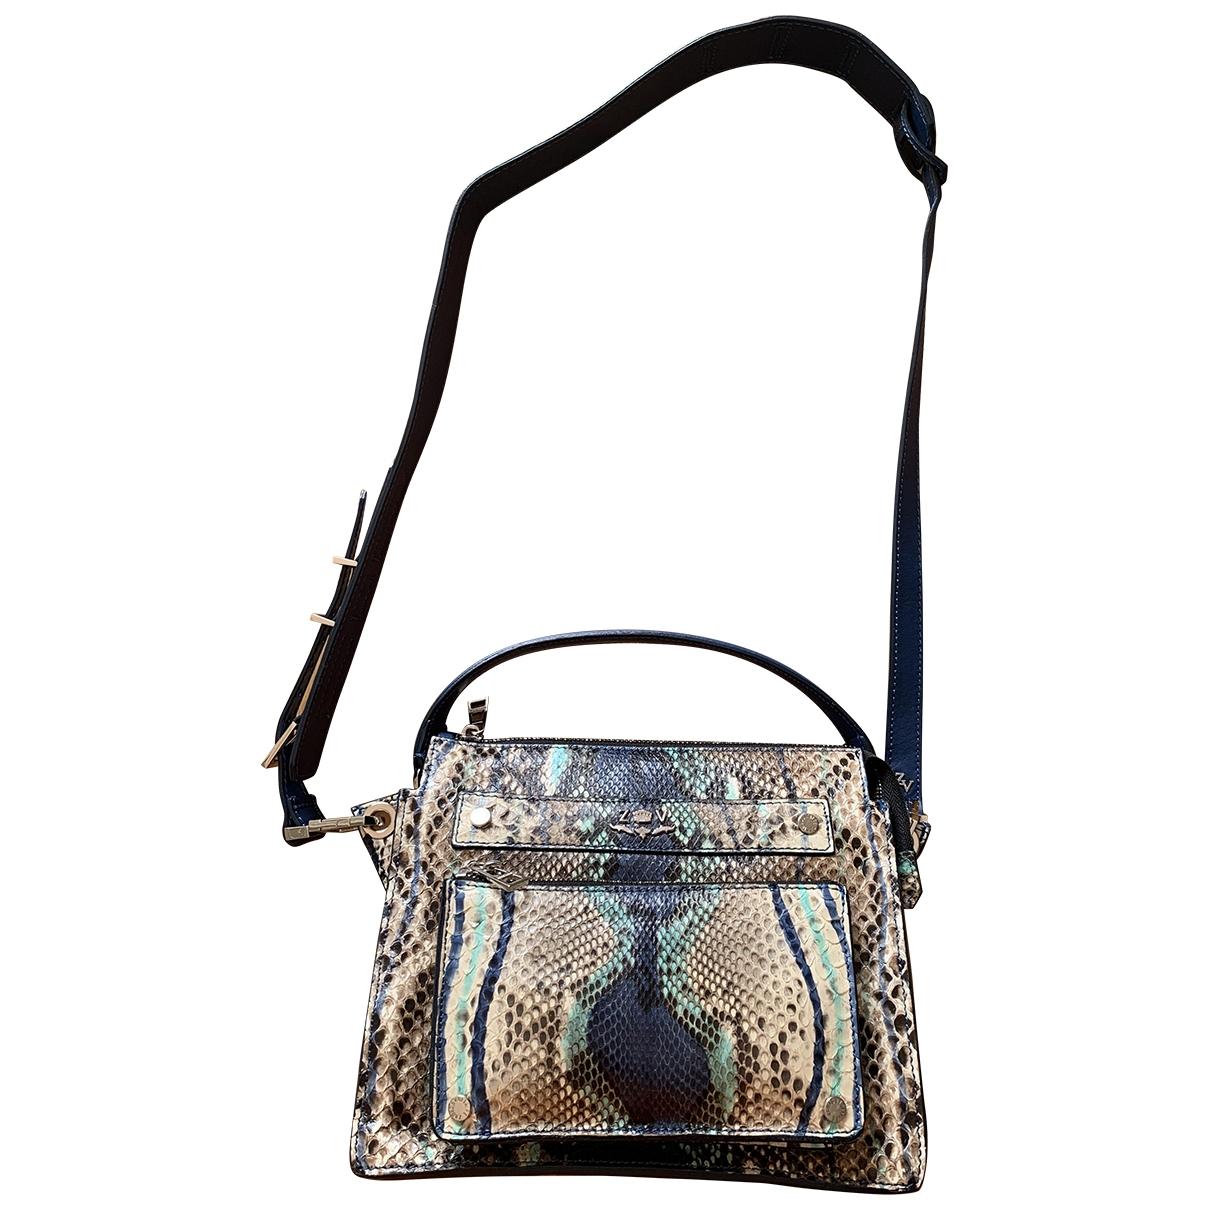 Zadig & Voltaire \N Multicolour Python Clutch bag for Women \N